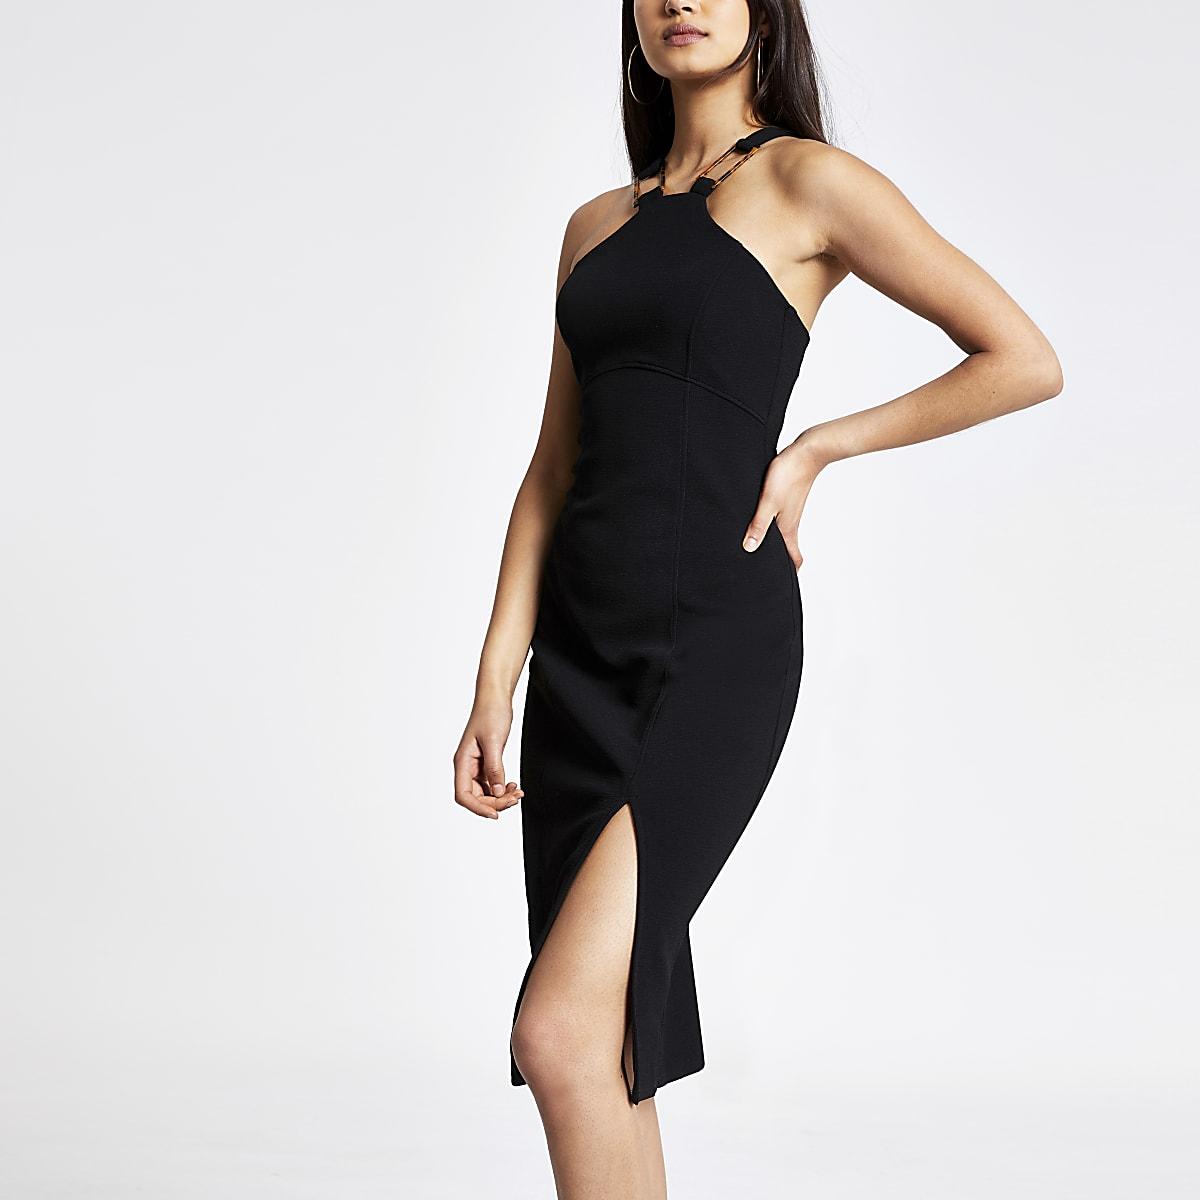 7f25b12b371 Robe moulante mi-longue noire - Robes moulantes - Robes - Femme